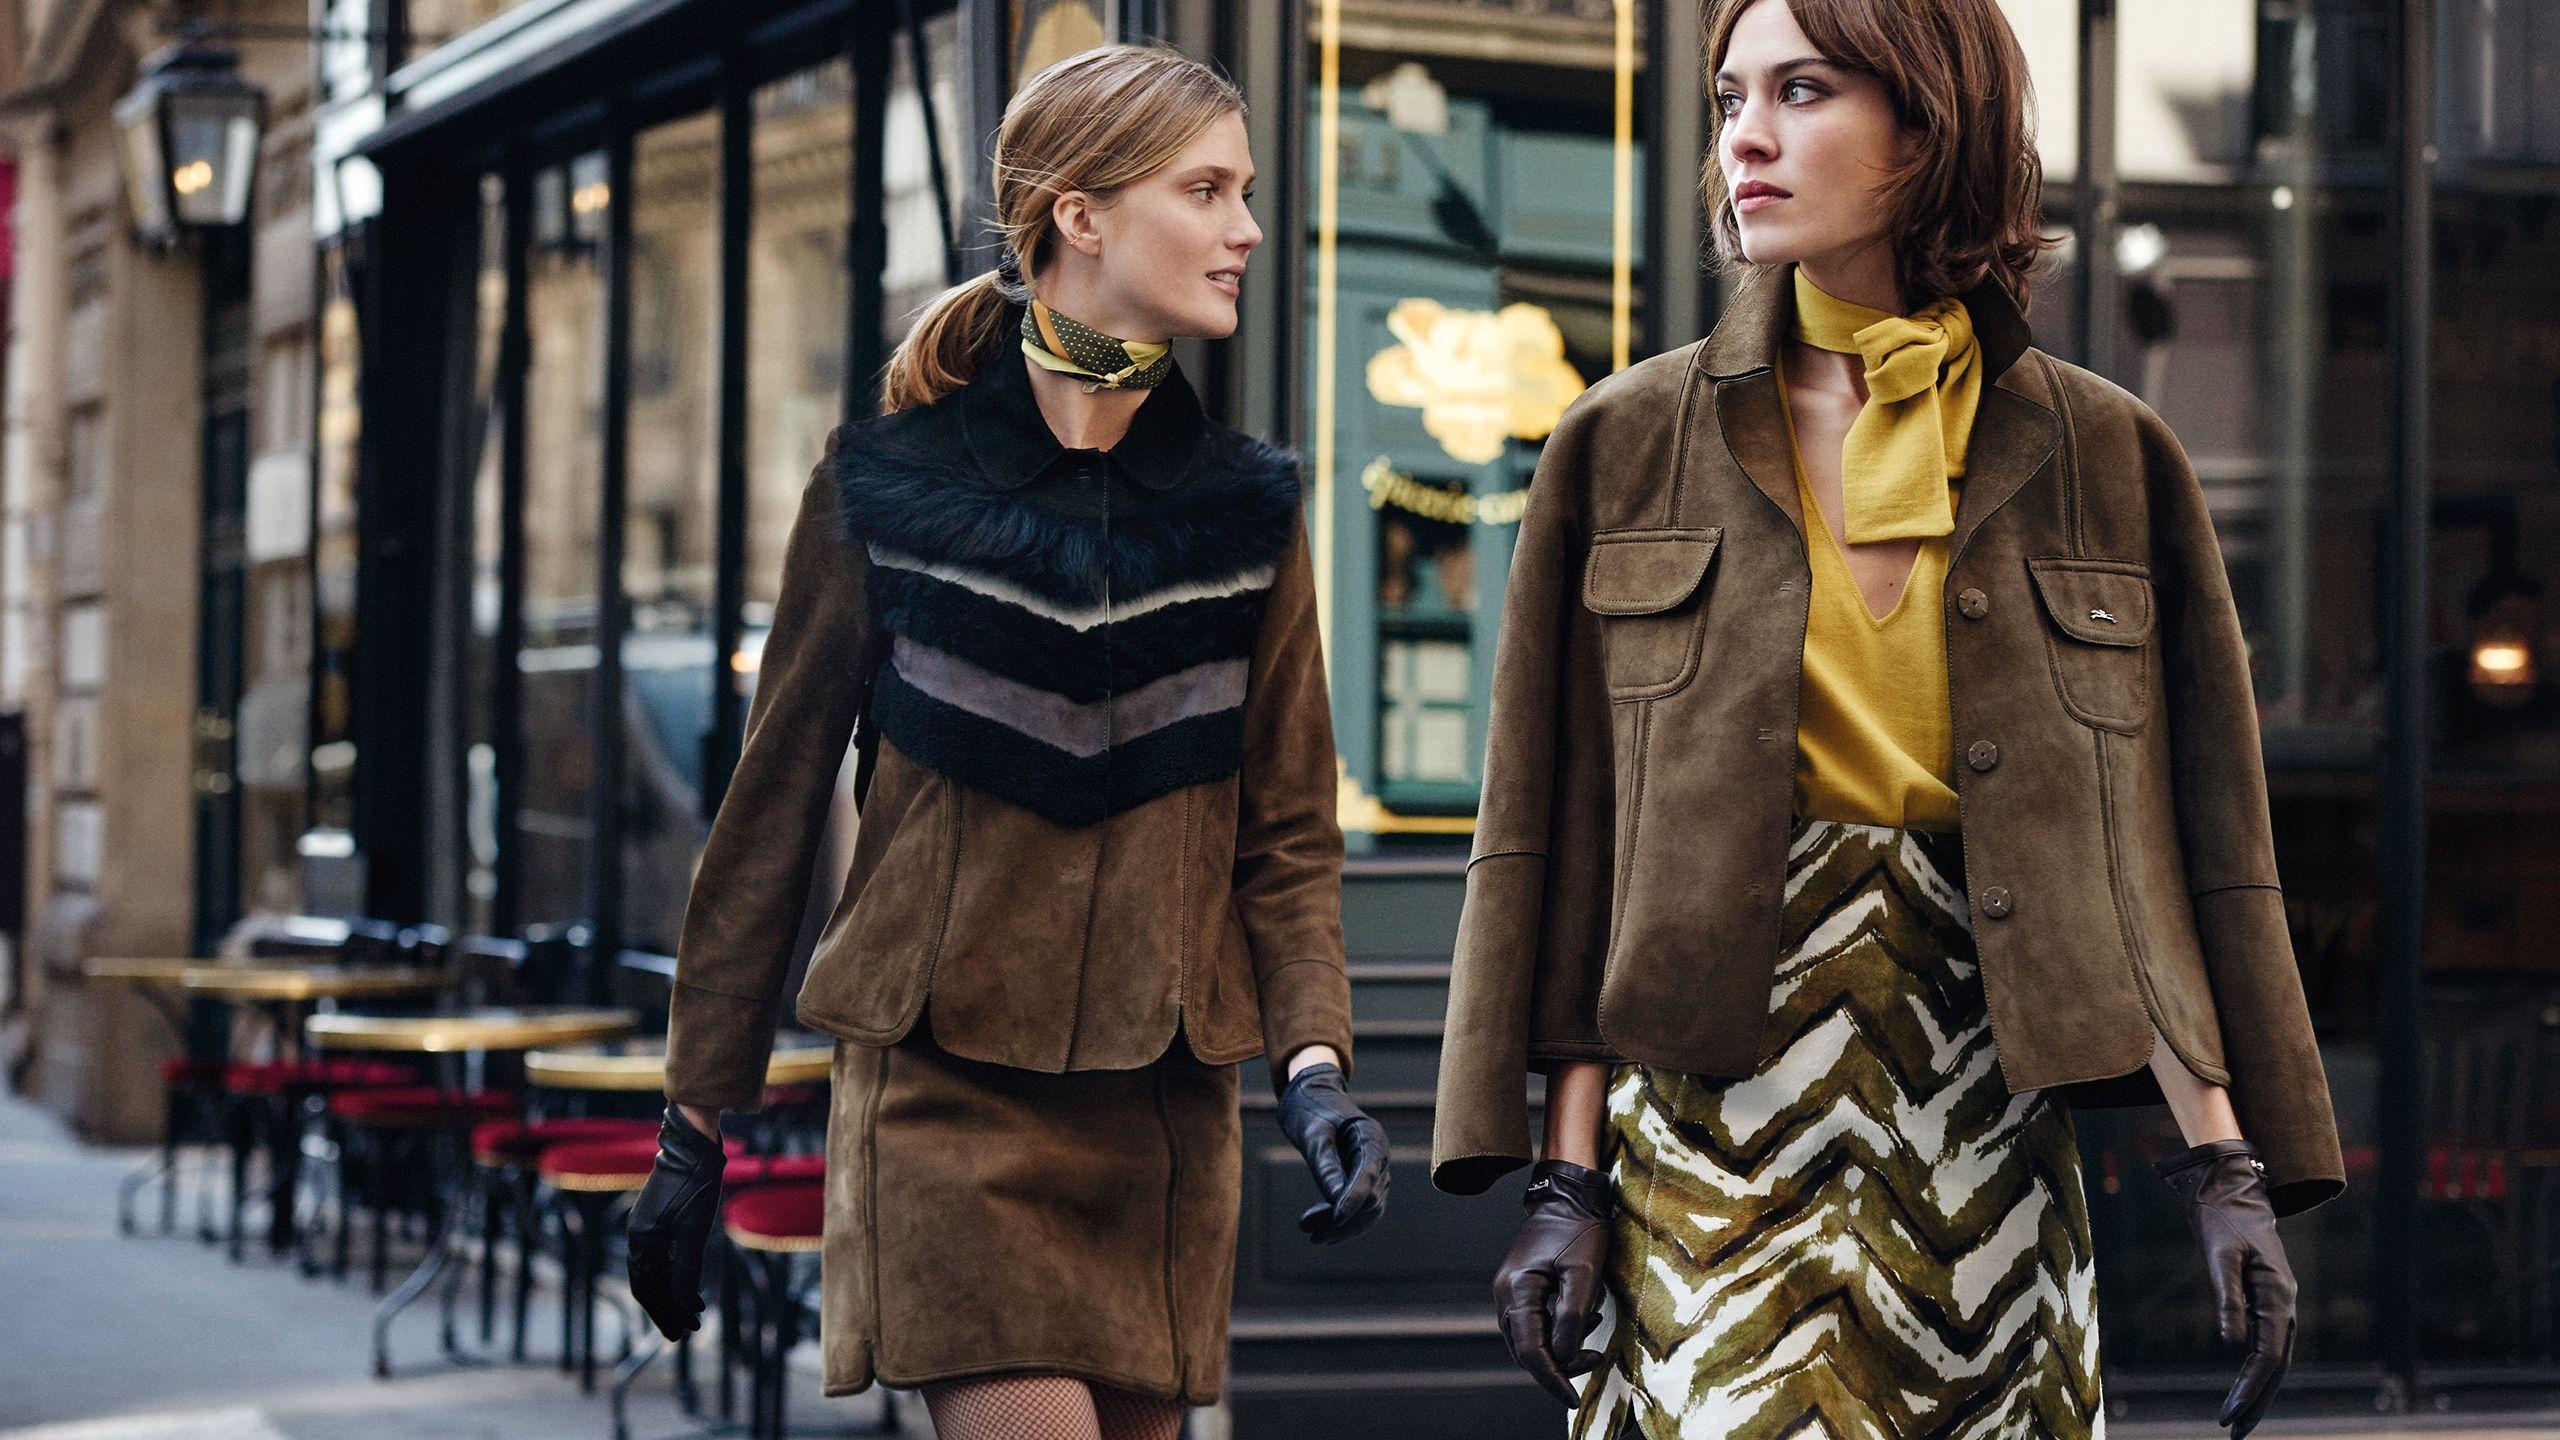 Longchamp Fall 2016 new campaign. Discover it on www.longchamp.com